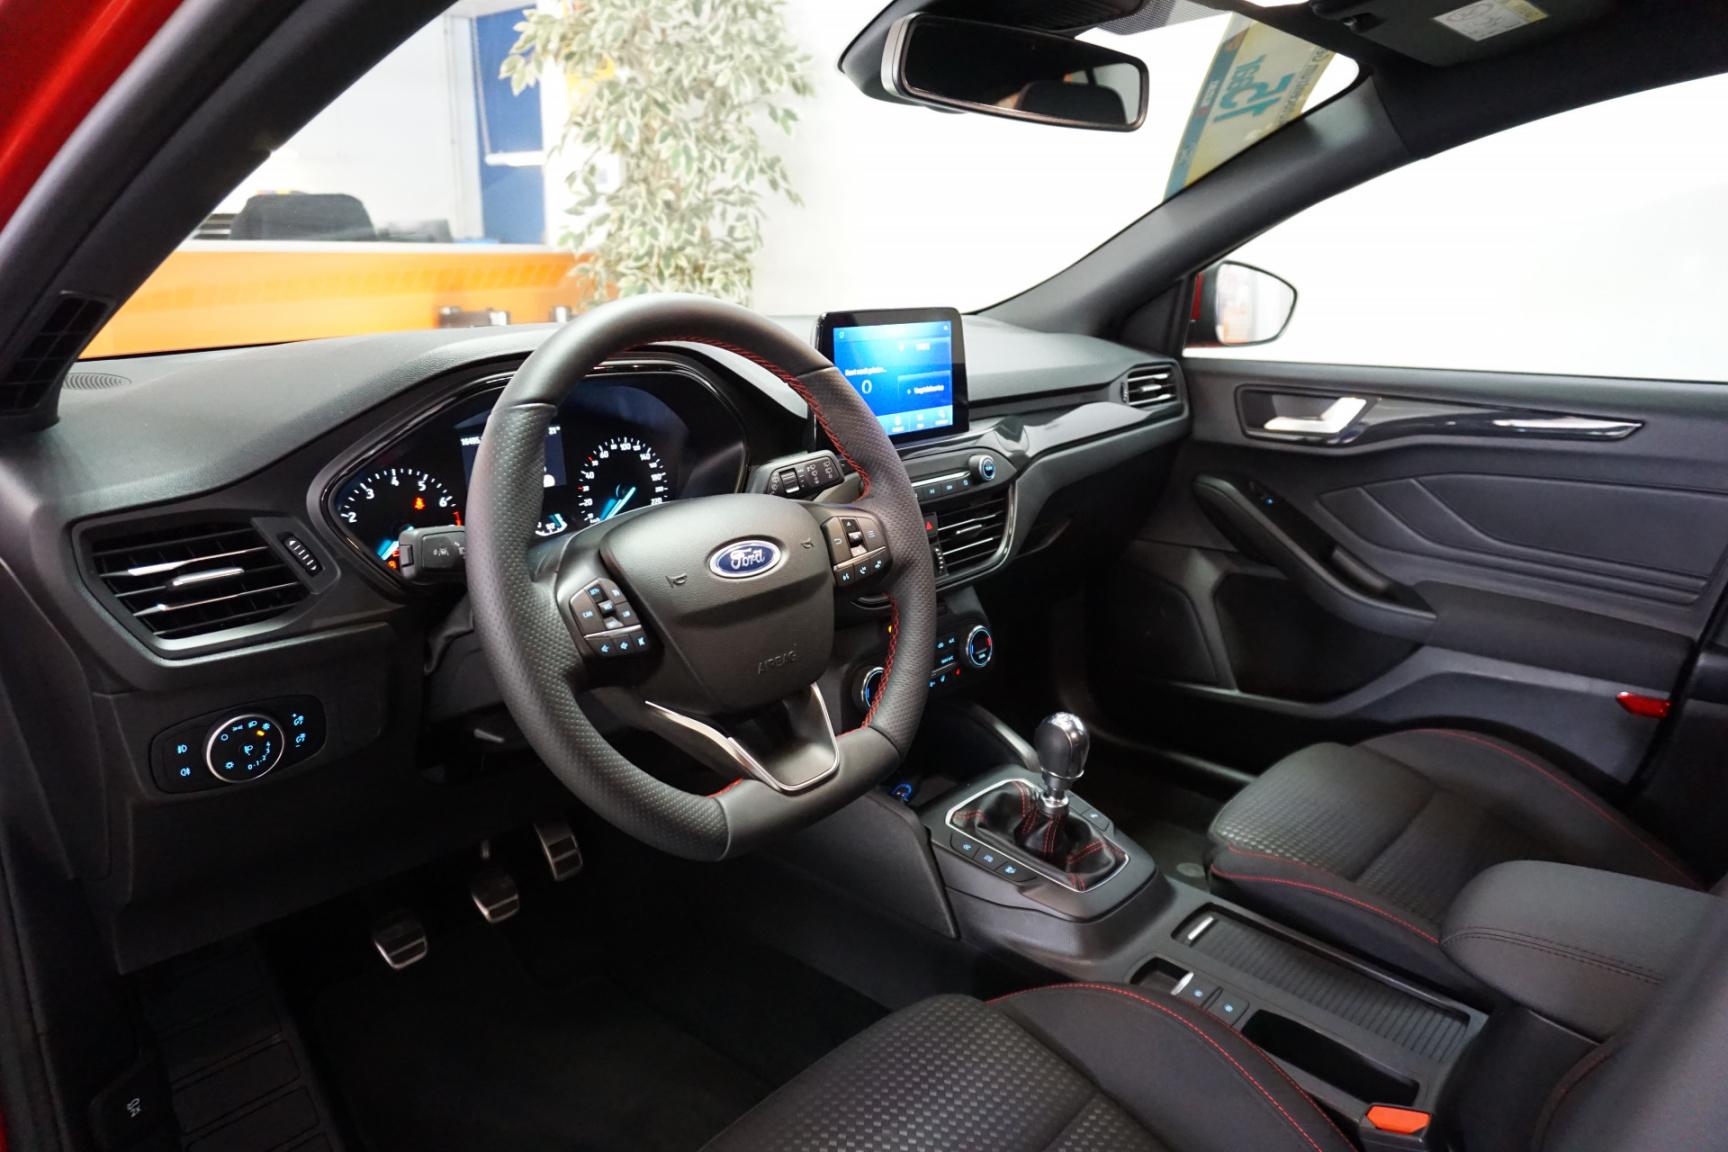 Ford-Focus-21